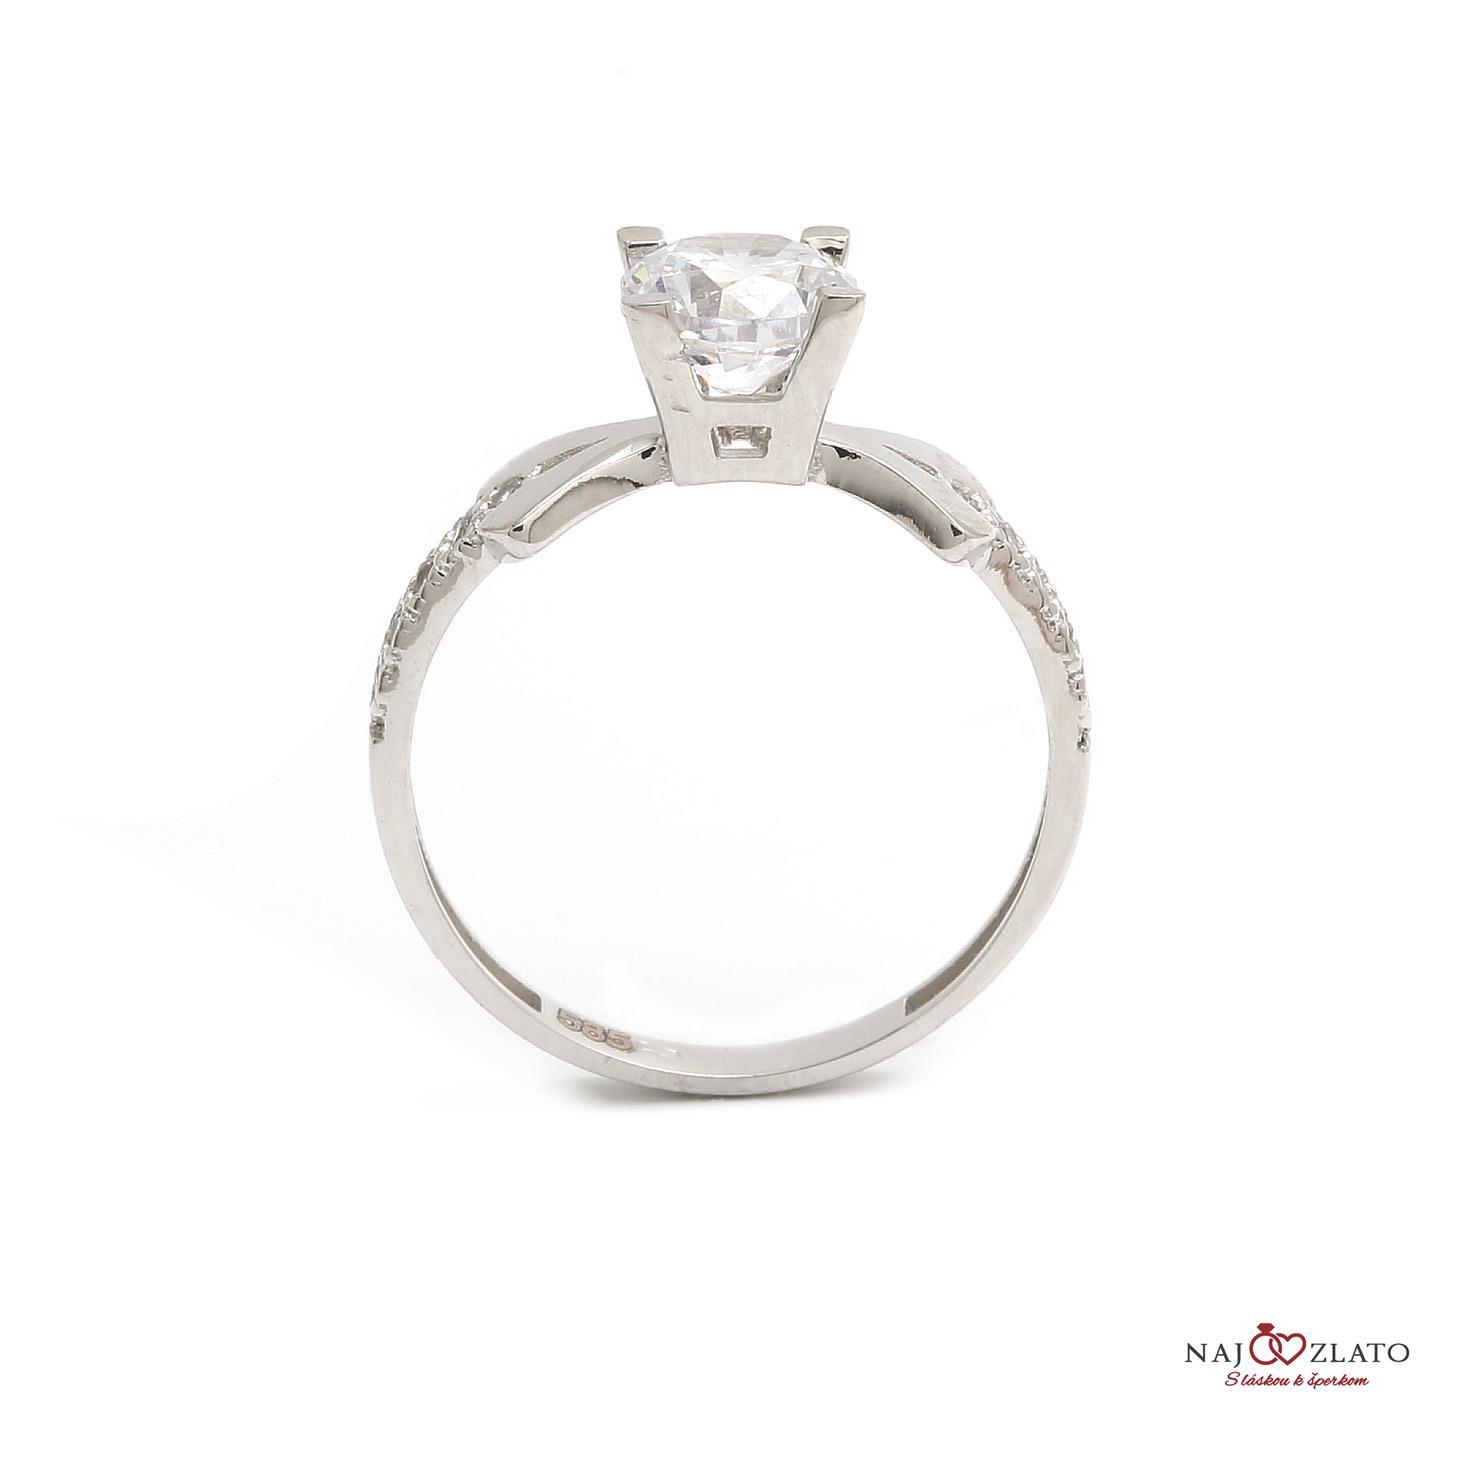 zlatý zásnubný prsteň shadi zlatý zásnubný prsteň shadi 2 ... ecb5074c046